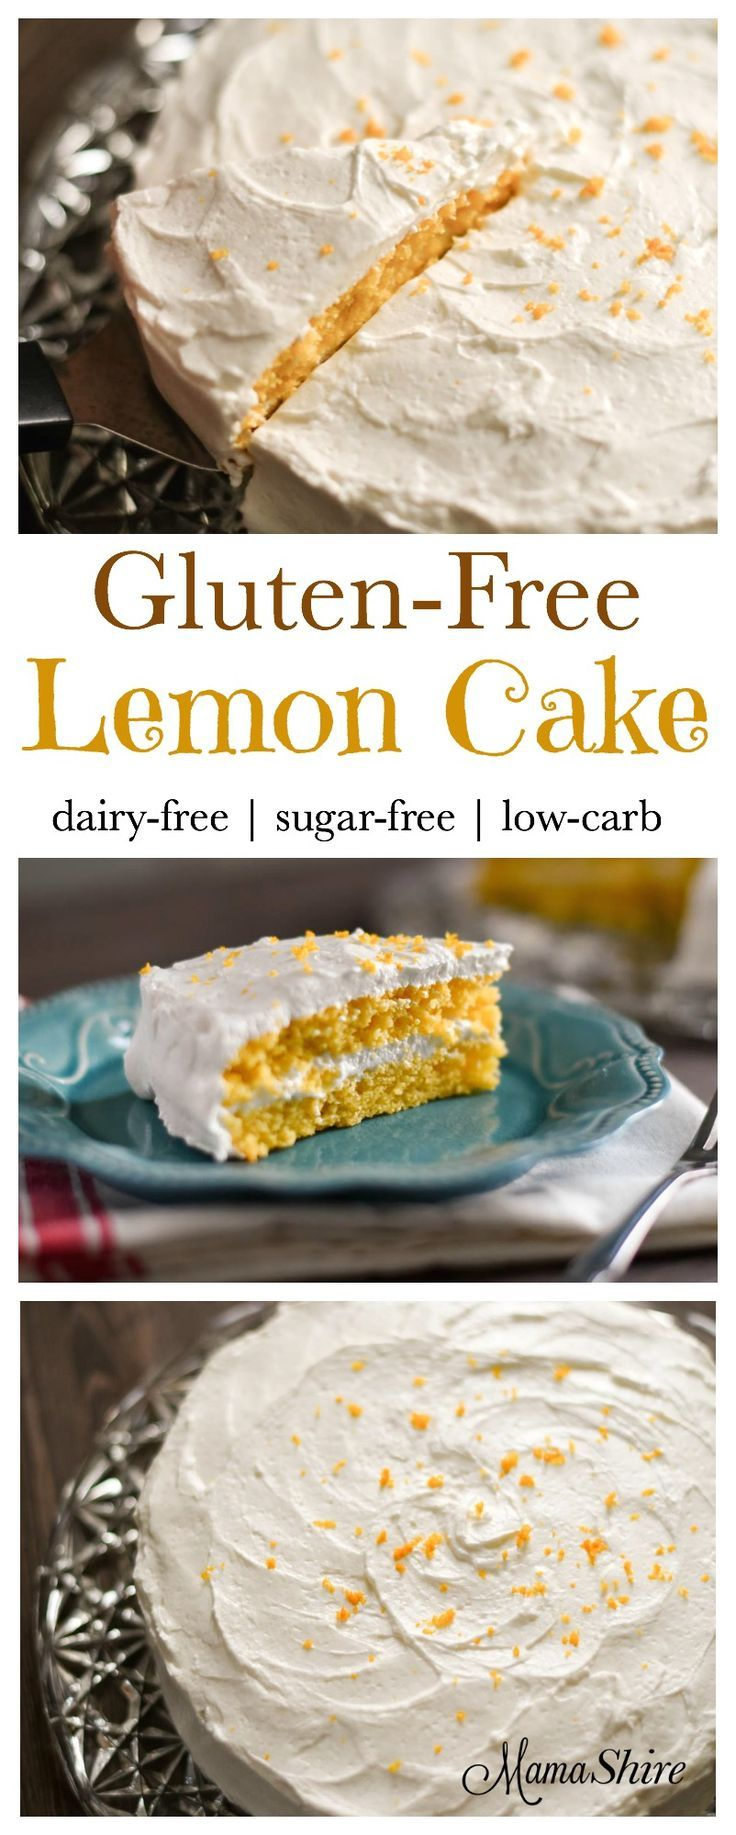 Gluten Free Lemon Cake With Lemon Frosting Mamashire Recipe Gluten Free Lemon Cake Gluten Free Lemon Sugar Free Desserts